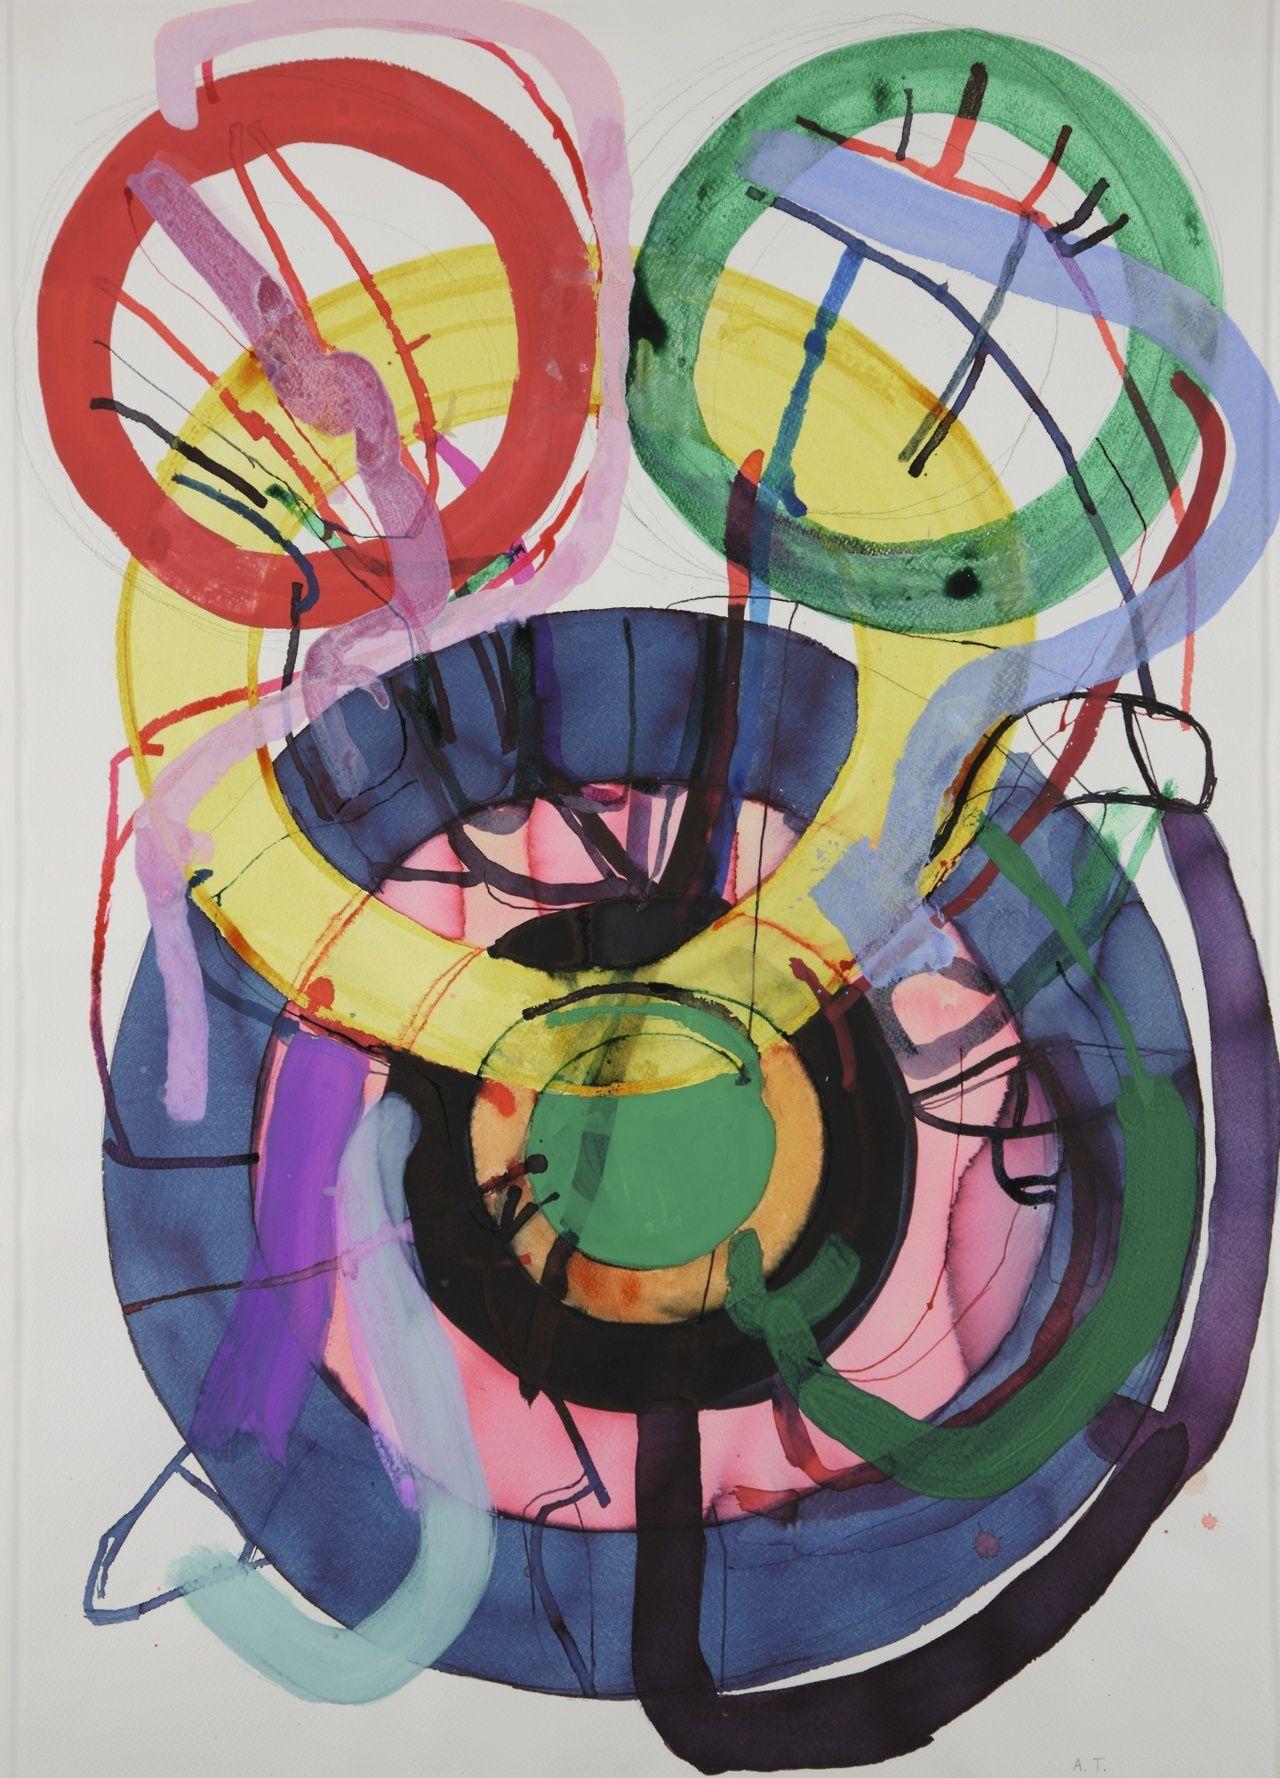 Atsuko Tanaka (19322005), Untitled, 1985, gouache, ink